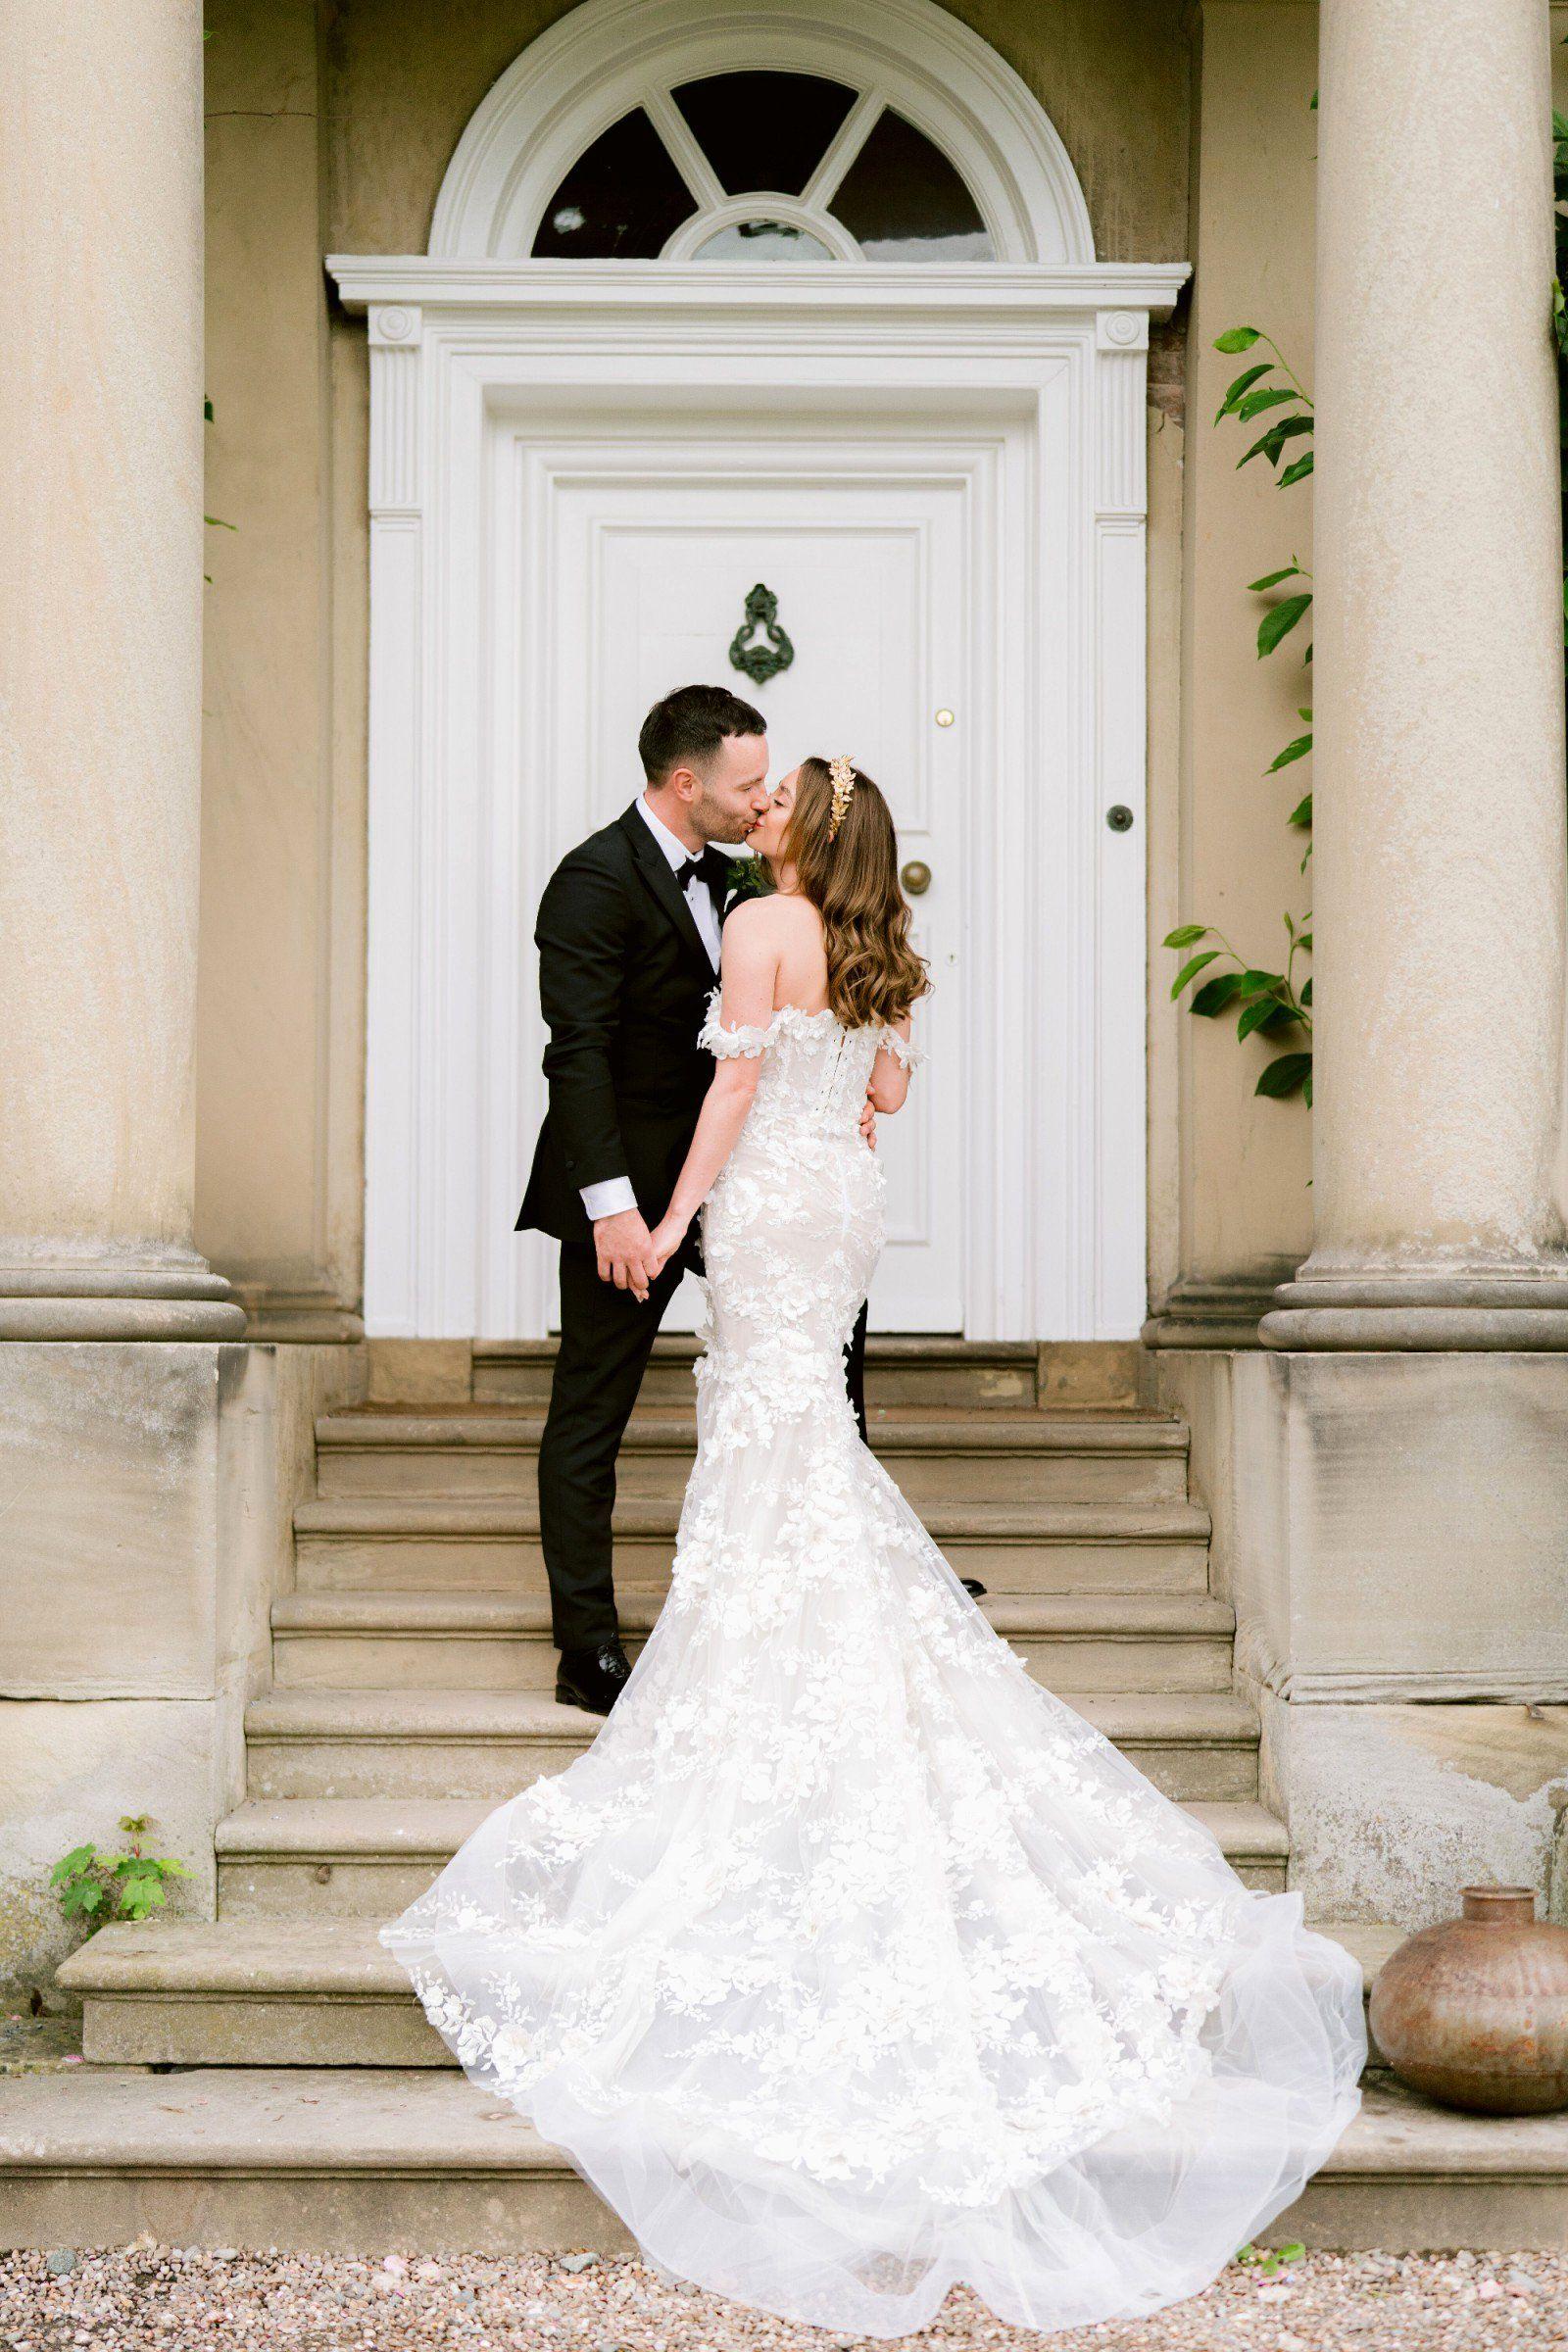 25 Wedding Dress For Over 50 Years Old Wedding Dresses Wedding Dresses For Sale Dresses